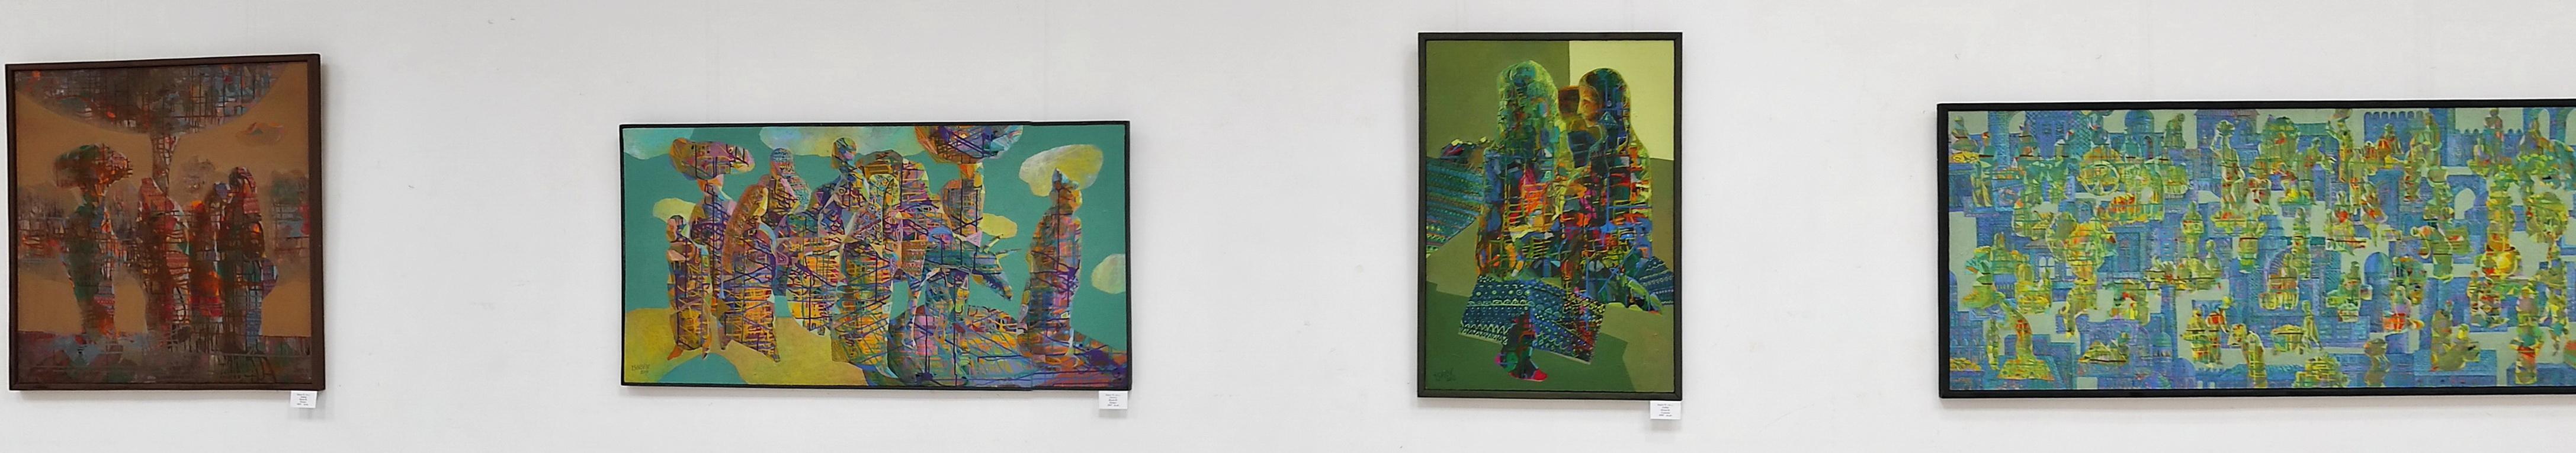 Исаев Аслиддин. Экспозиция картин